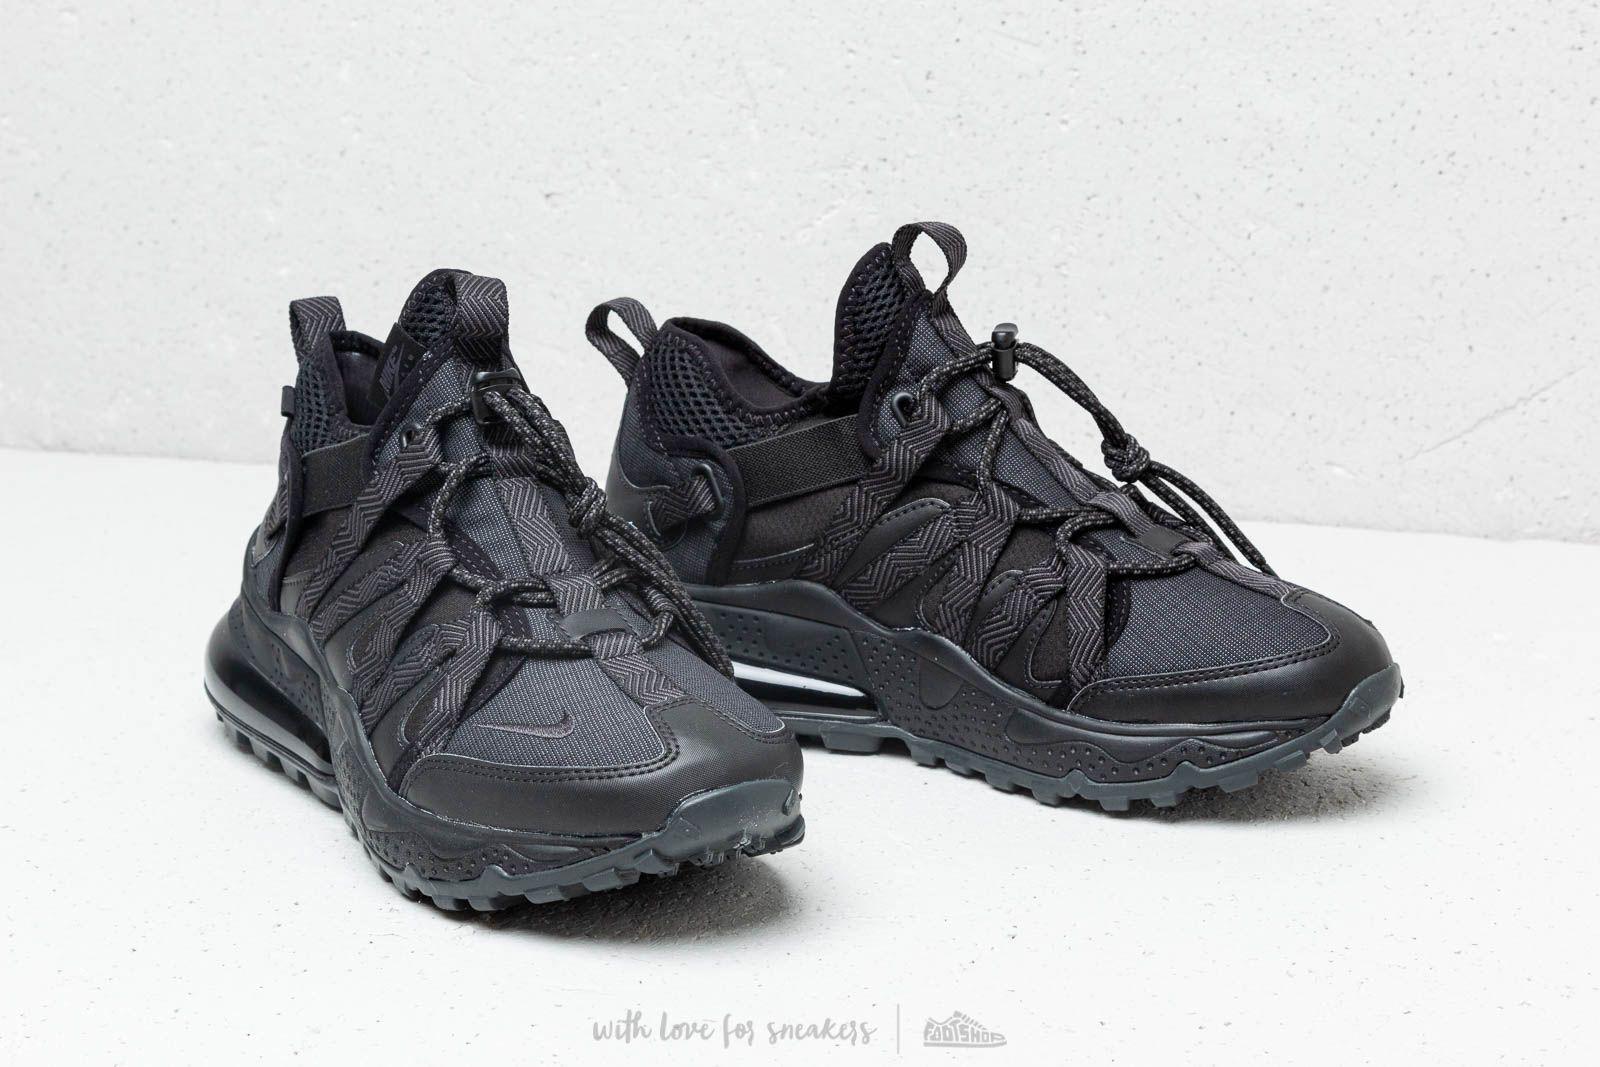 85e34c52e4655 Nike Air Max 270 Bowfin Black/ Anthracite-black in Black for Men - Lyst